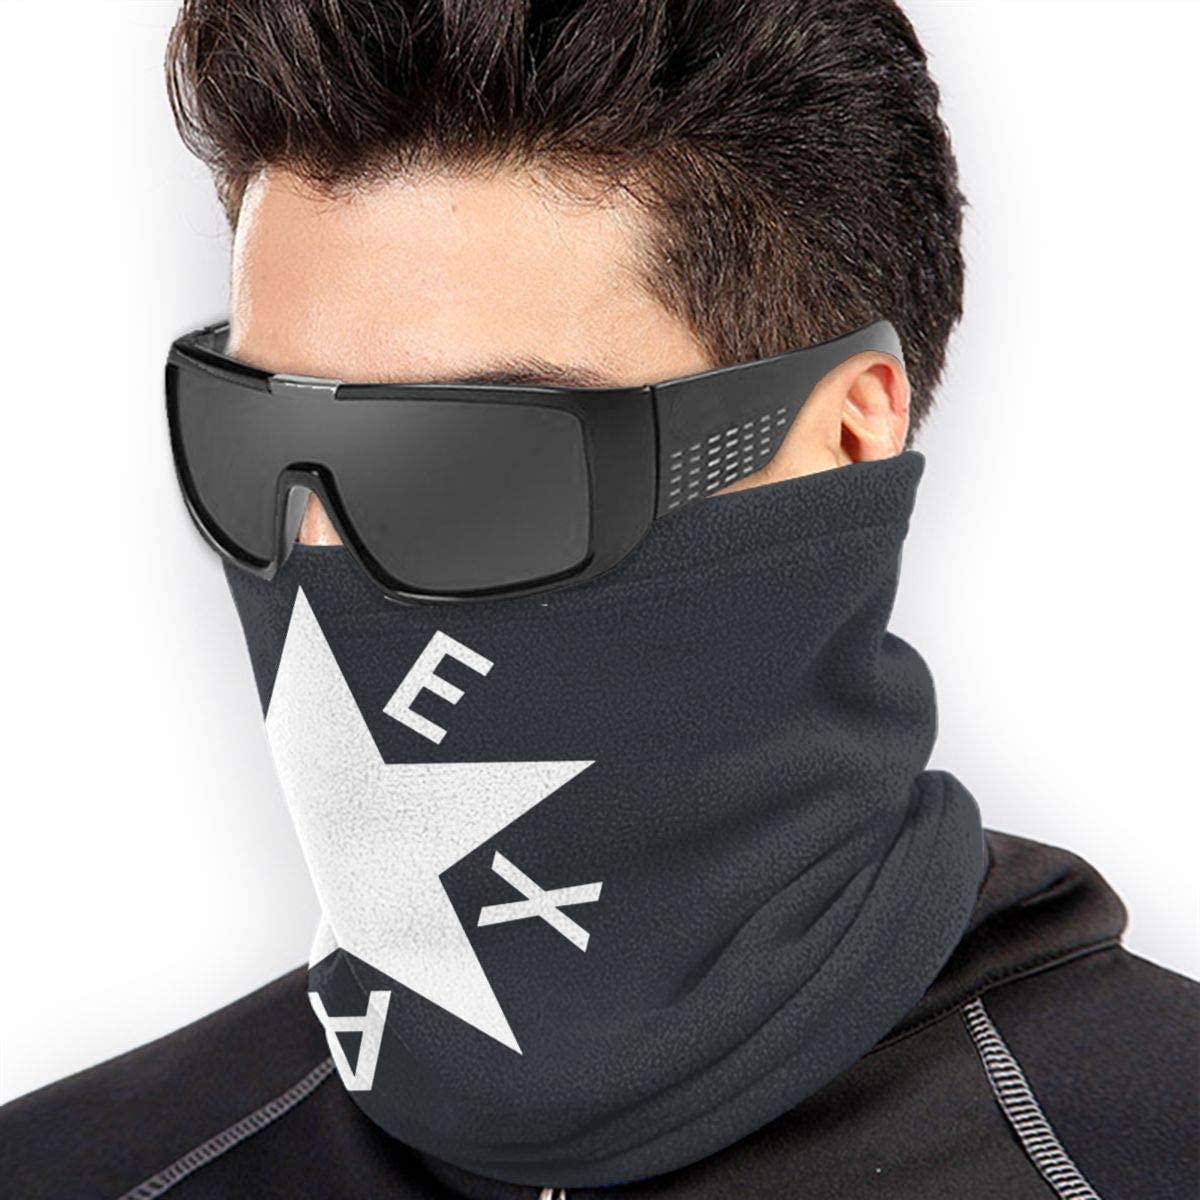 Texas De Zavala Flag Unisex Microfiber Neck Warmer Headwear Face Scarf Mask For Winter Cold Weather Mask Bandana Balaclava